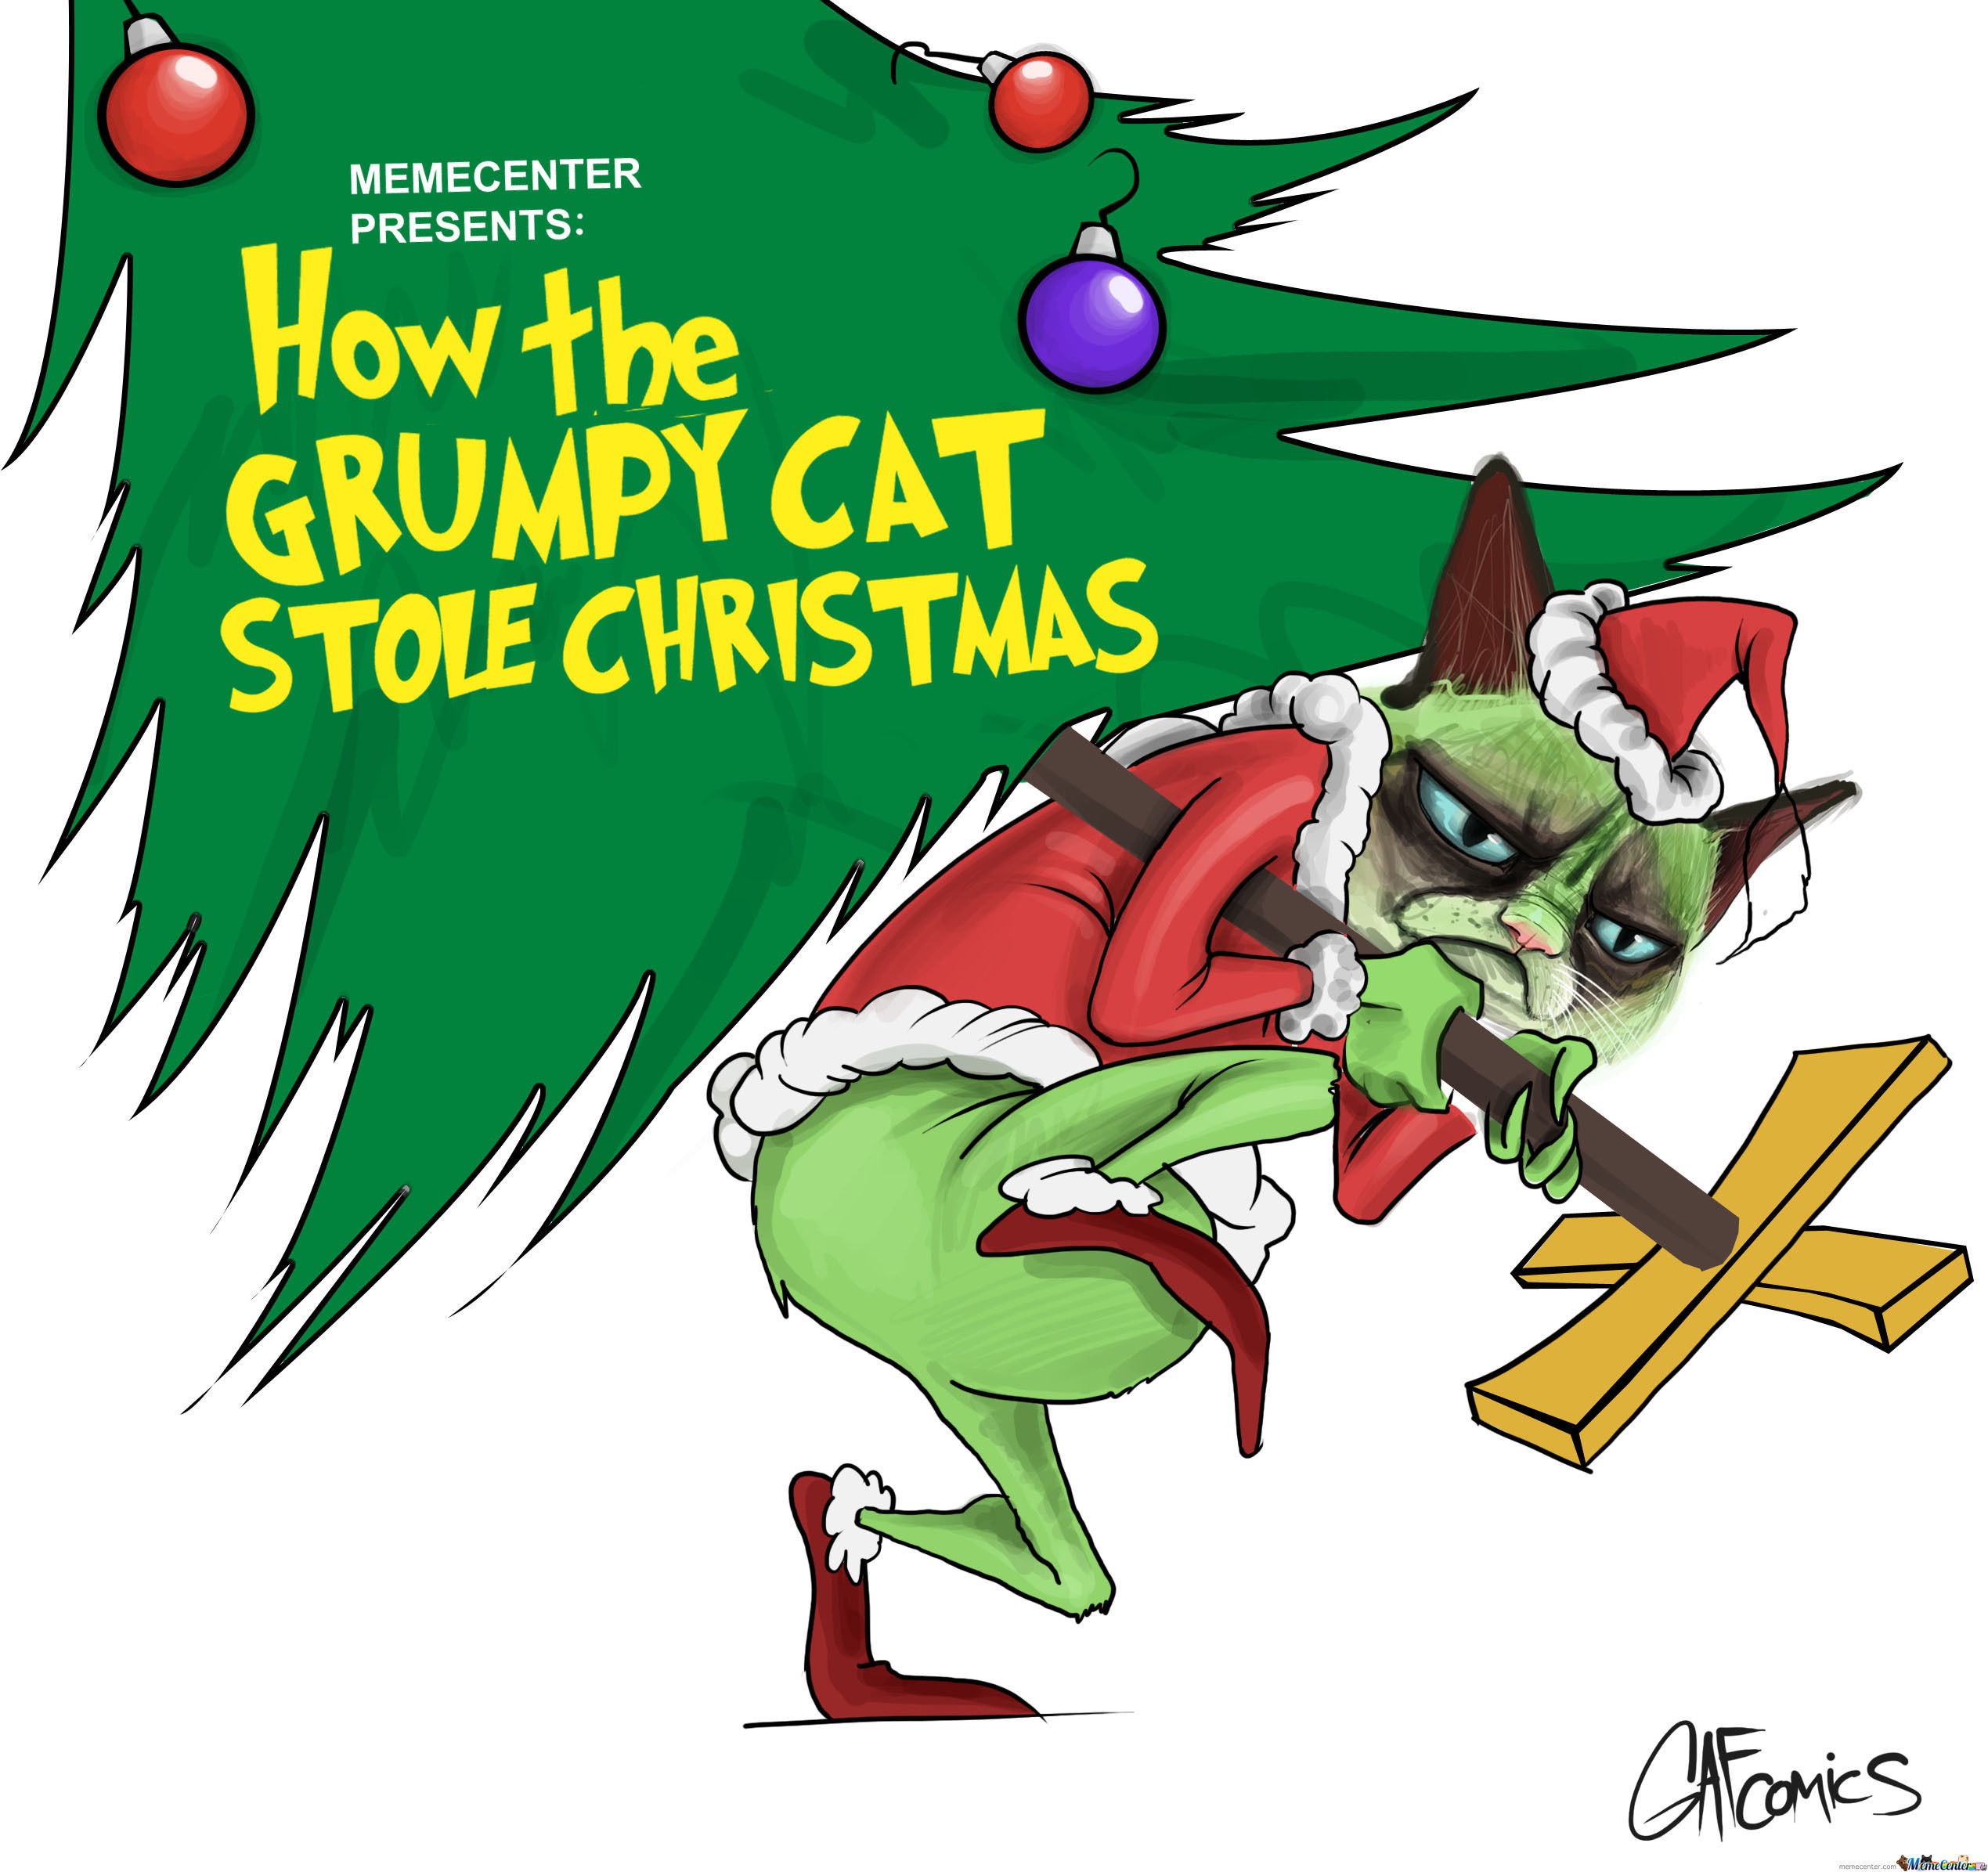 how-the-grumpy-cat-stole-christmas_o_985474